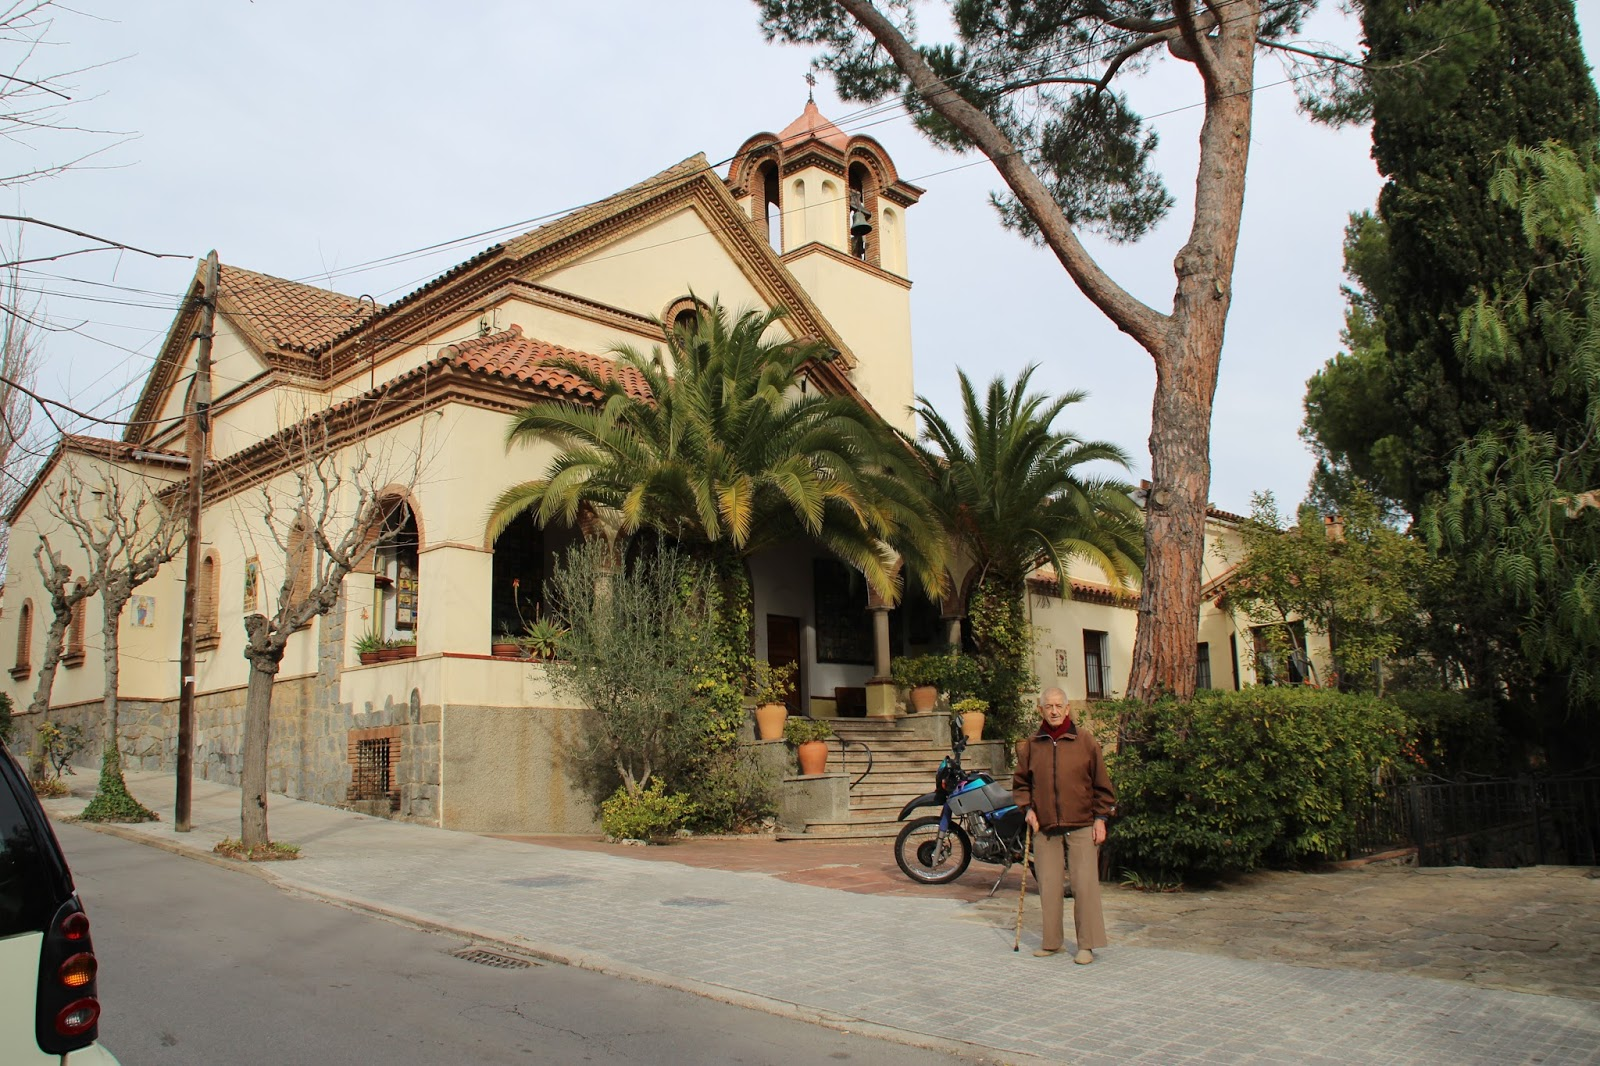 Con ixer catalunya esgl sia de la santa creu bellaterra - Casas en valles occidental ...